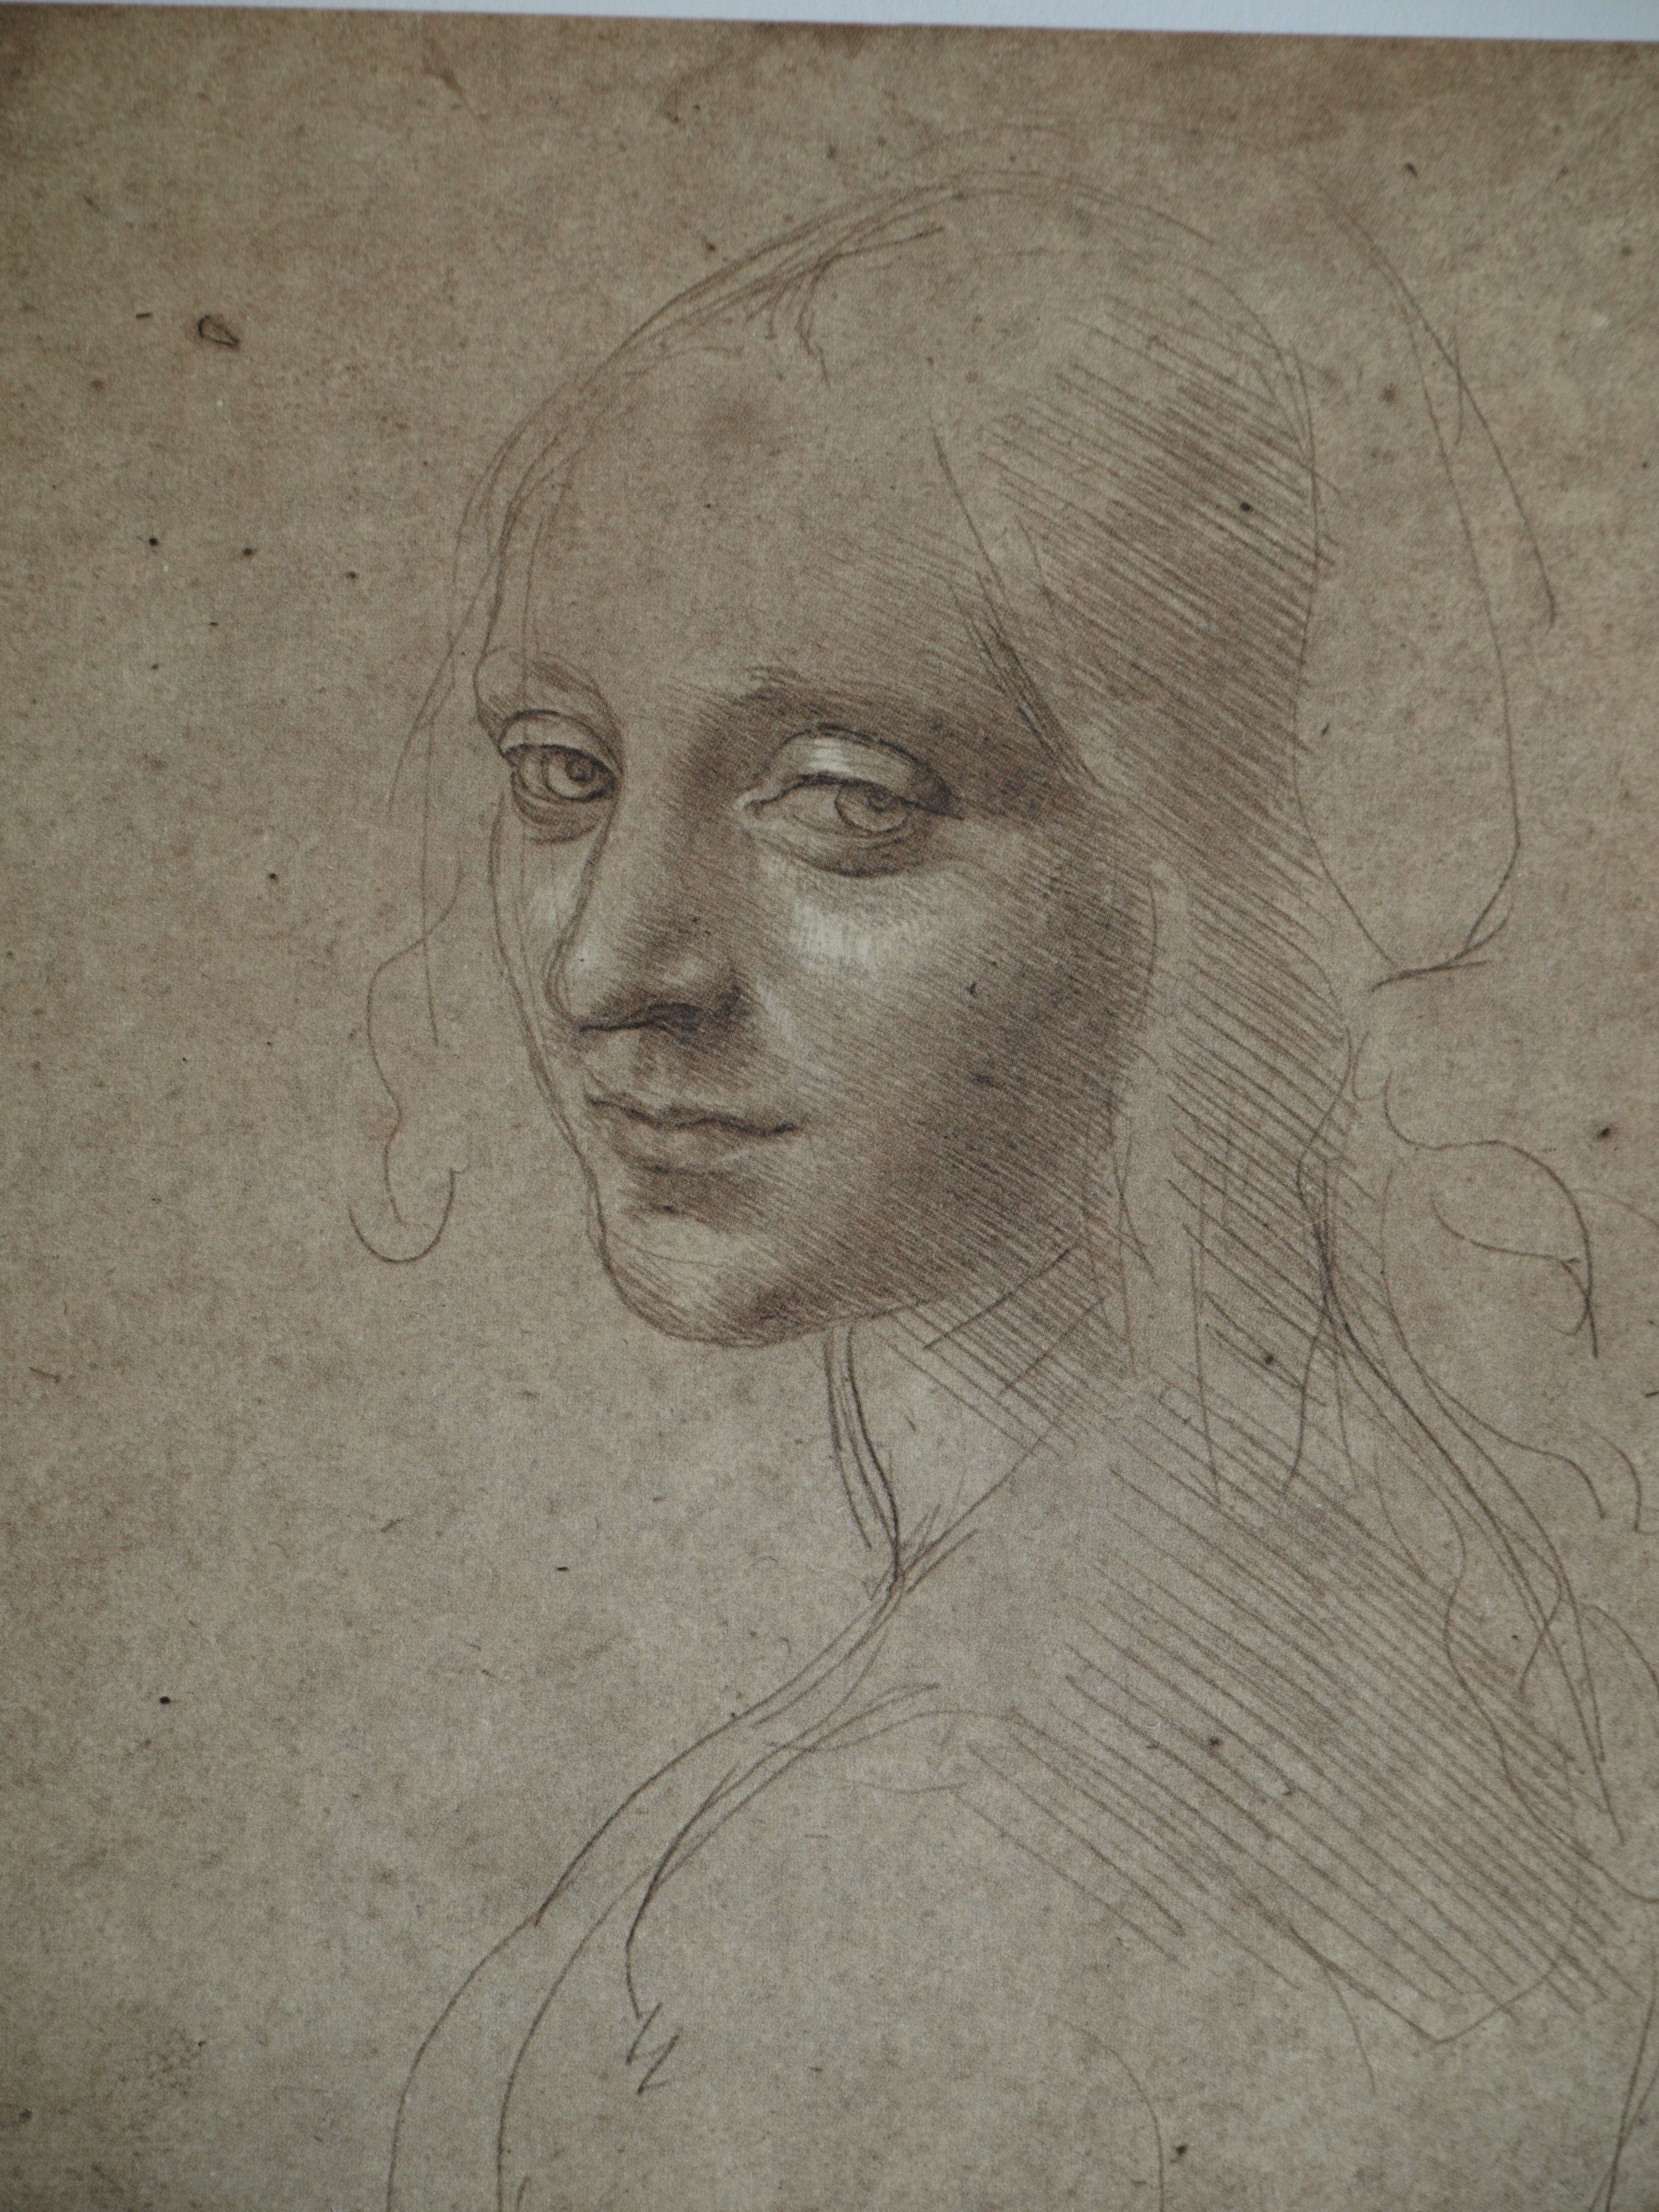 Da Vinci, Boceto retrato femenino   Trazos y texturas   Pinterest ...